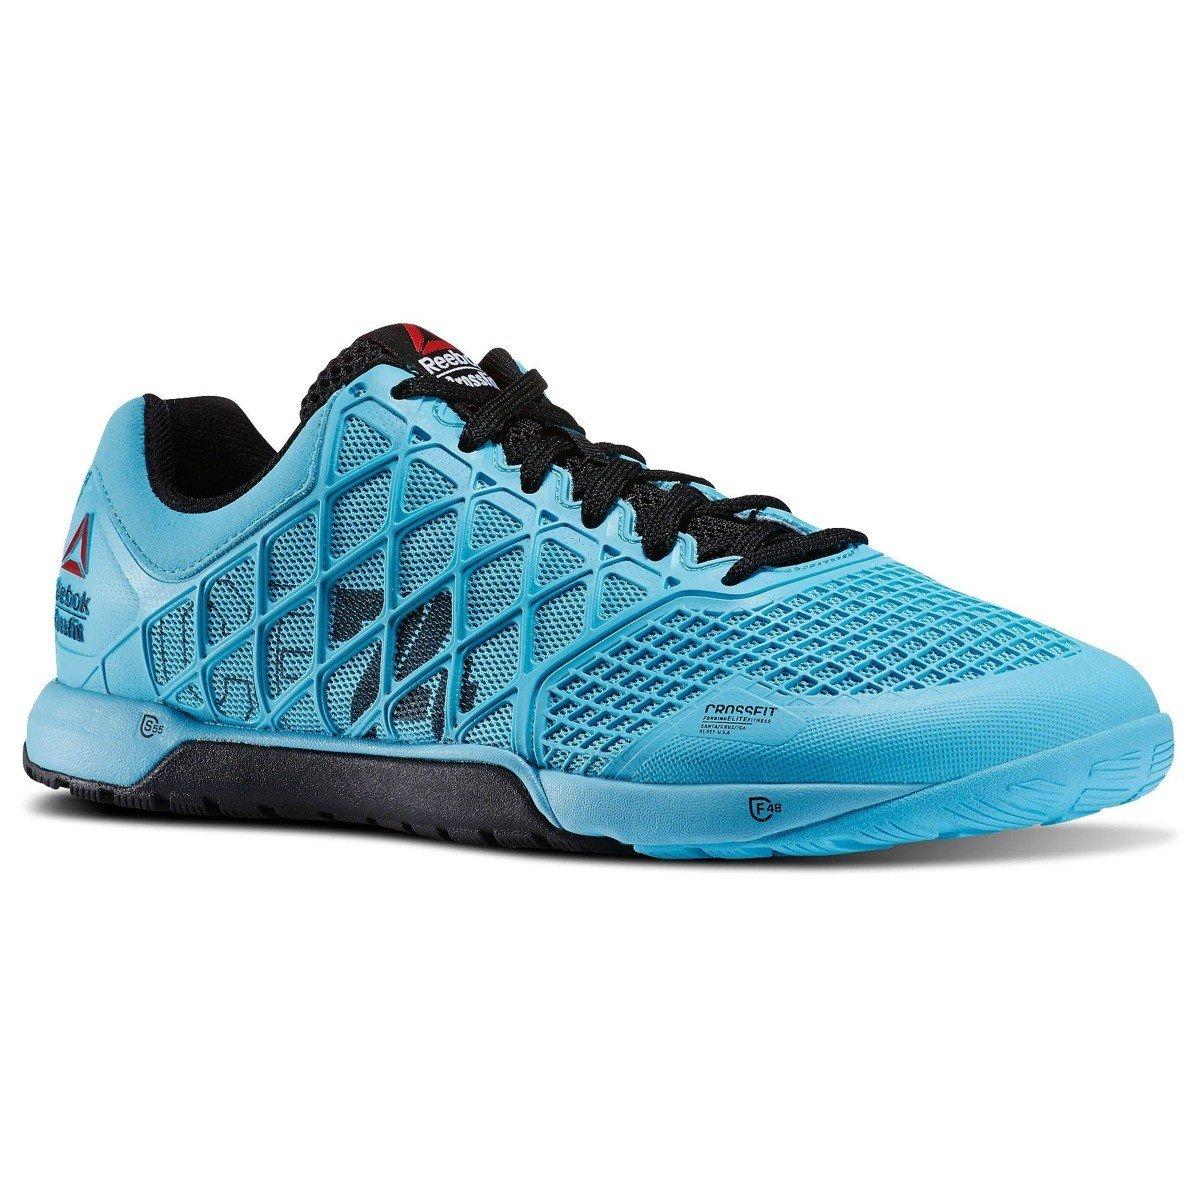 Buy Nano Crossfit Shoes